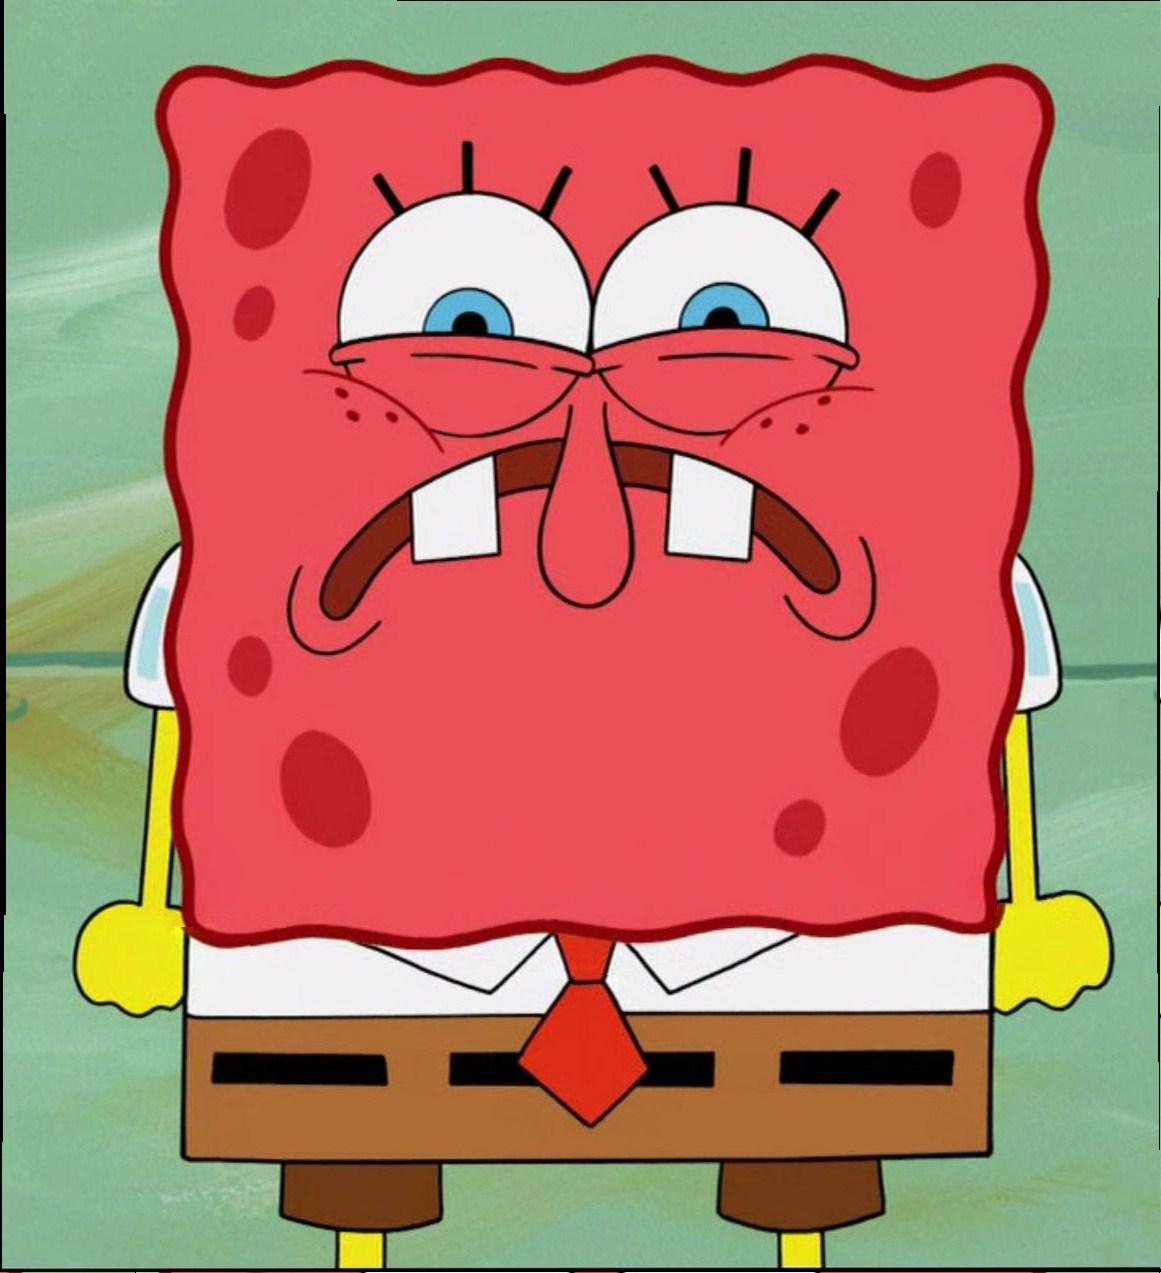 Spongebob Squarepants: Encyclopedia SpongeBobia